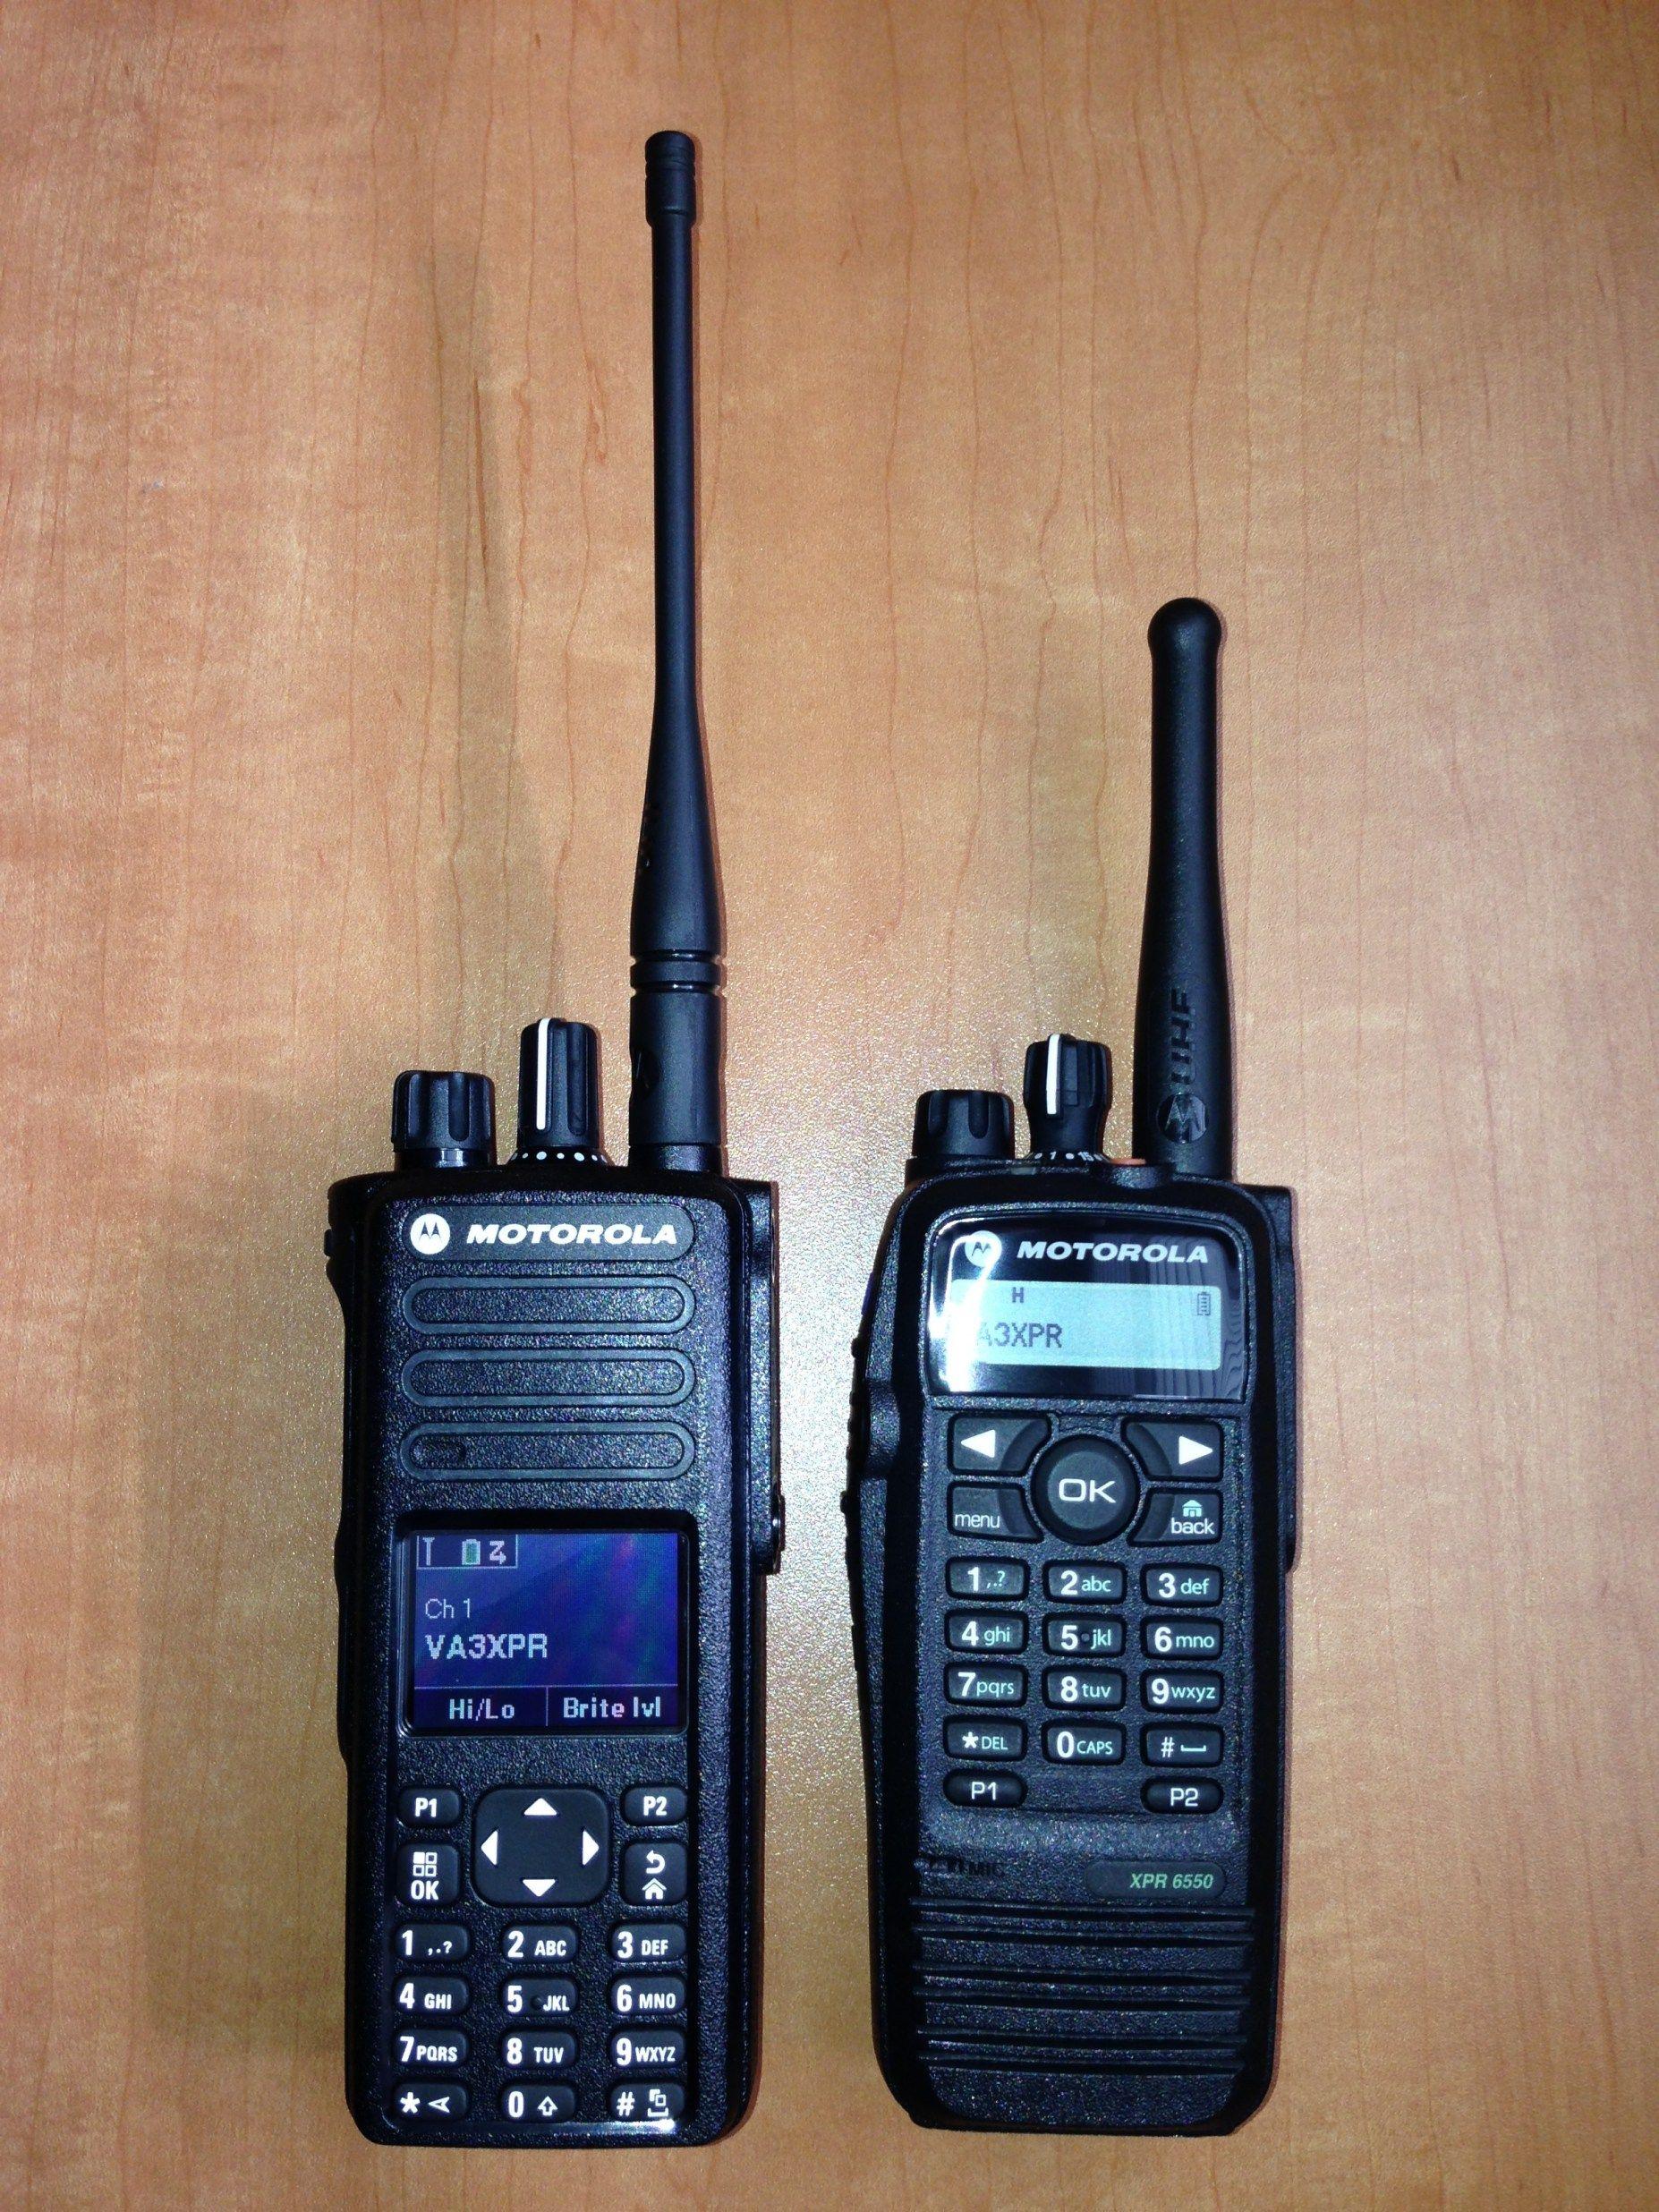 VA3XPR, Motorola, MOTOTRBO, XPR7550, XPR6550, XPR 6550, XPR